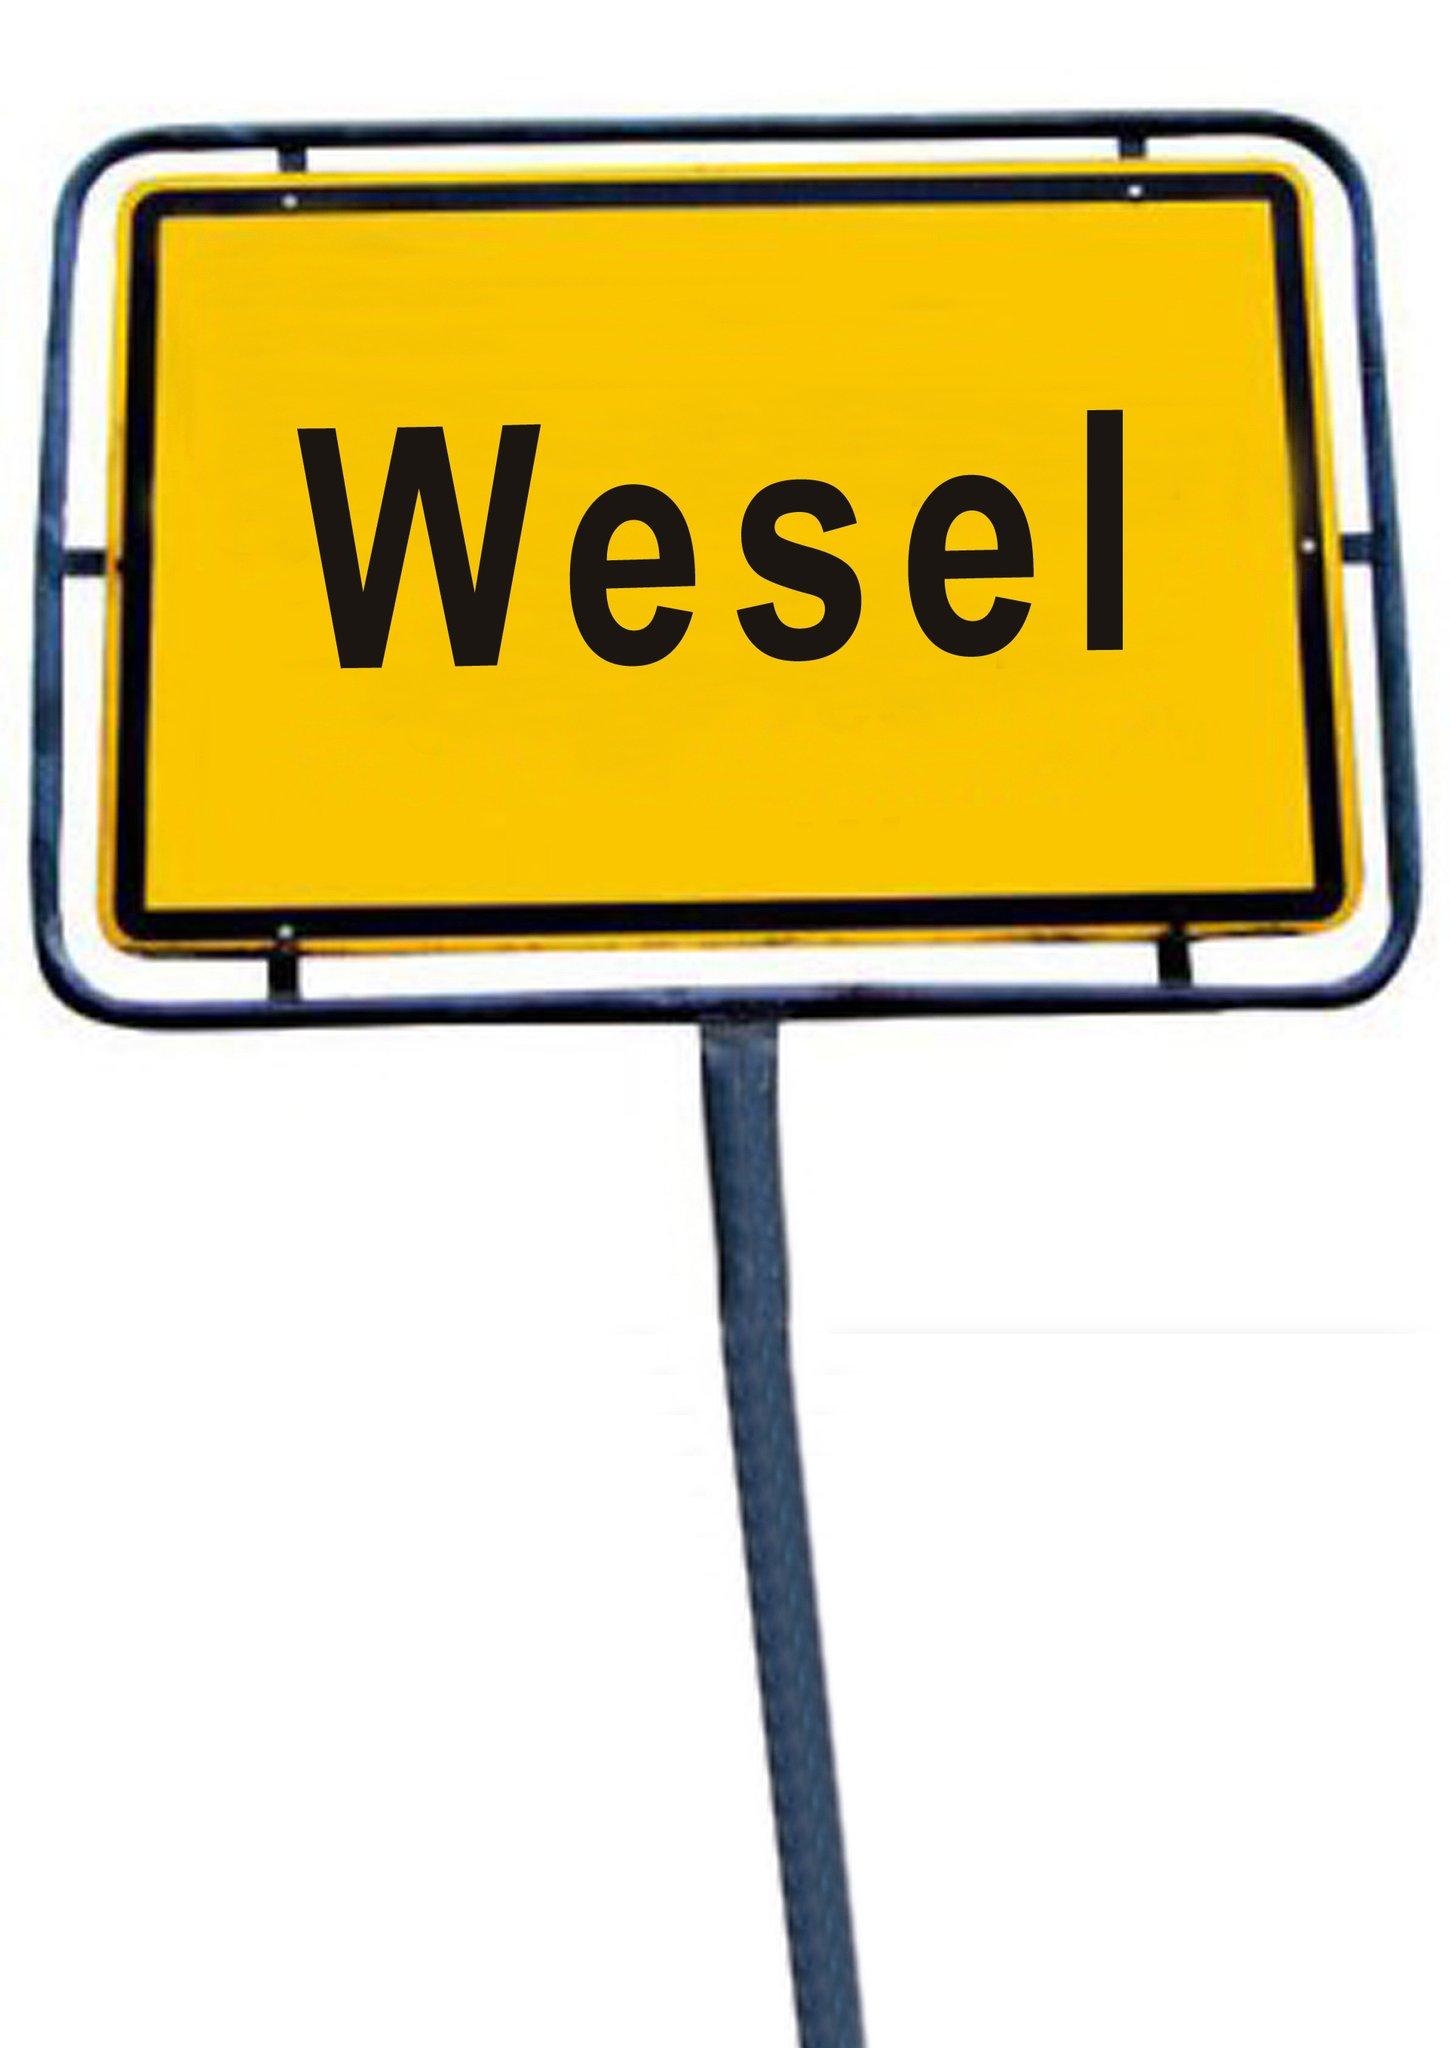 Bordell wesel